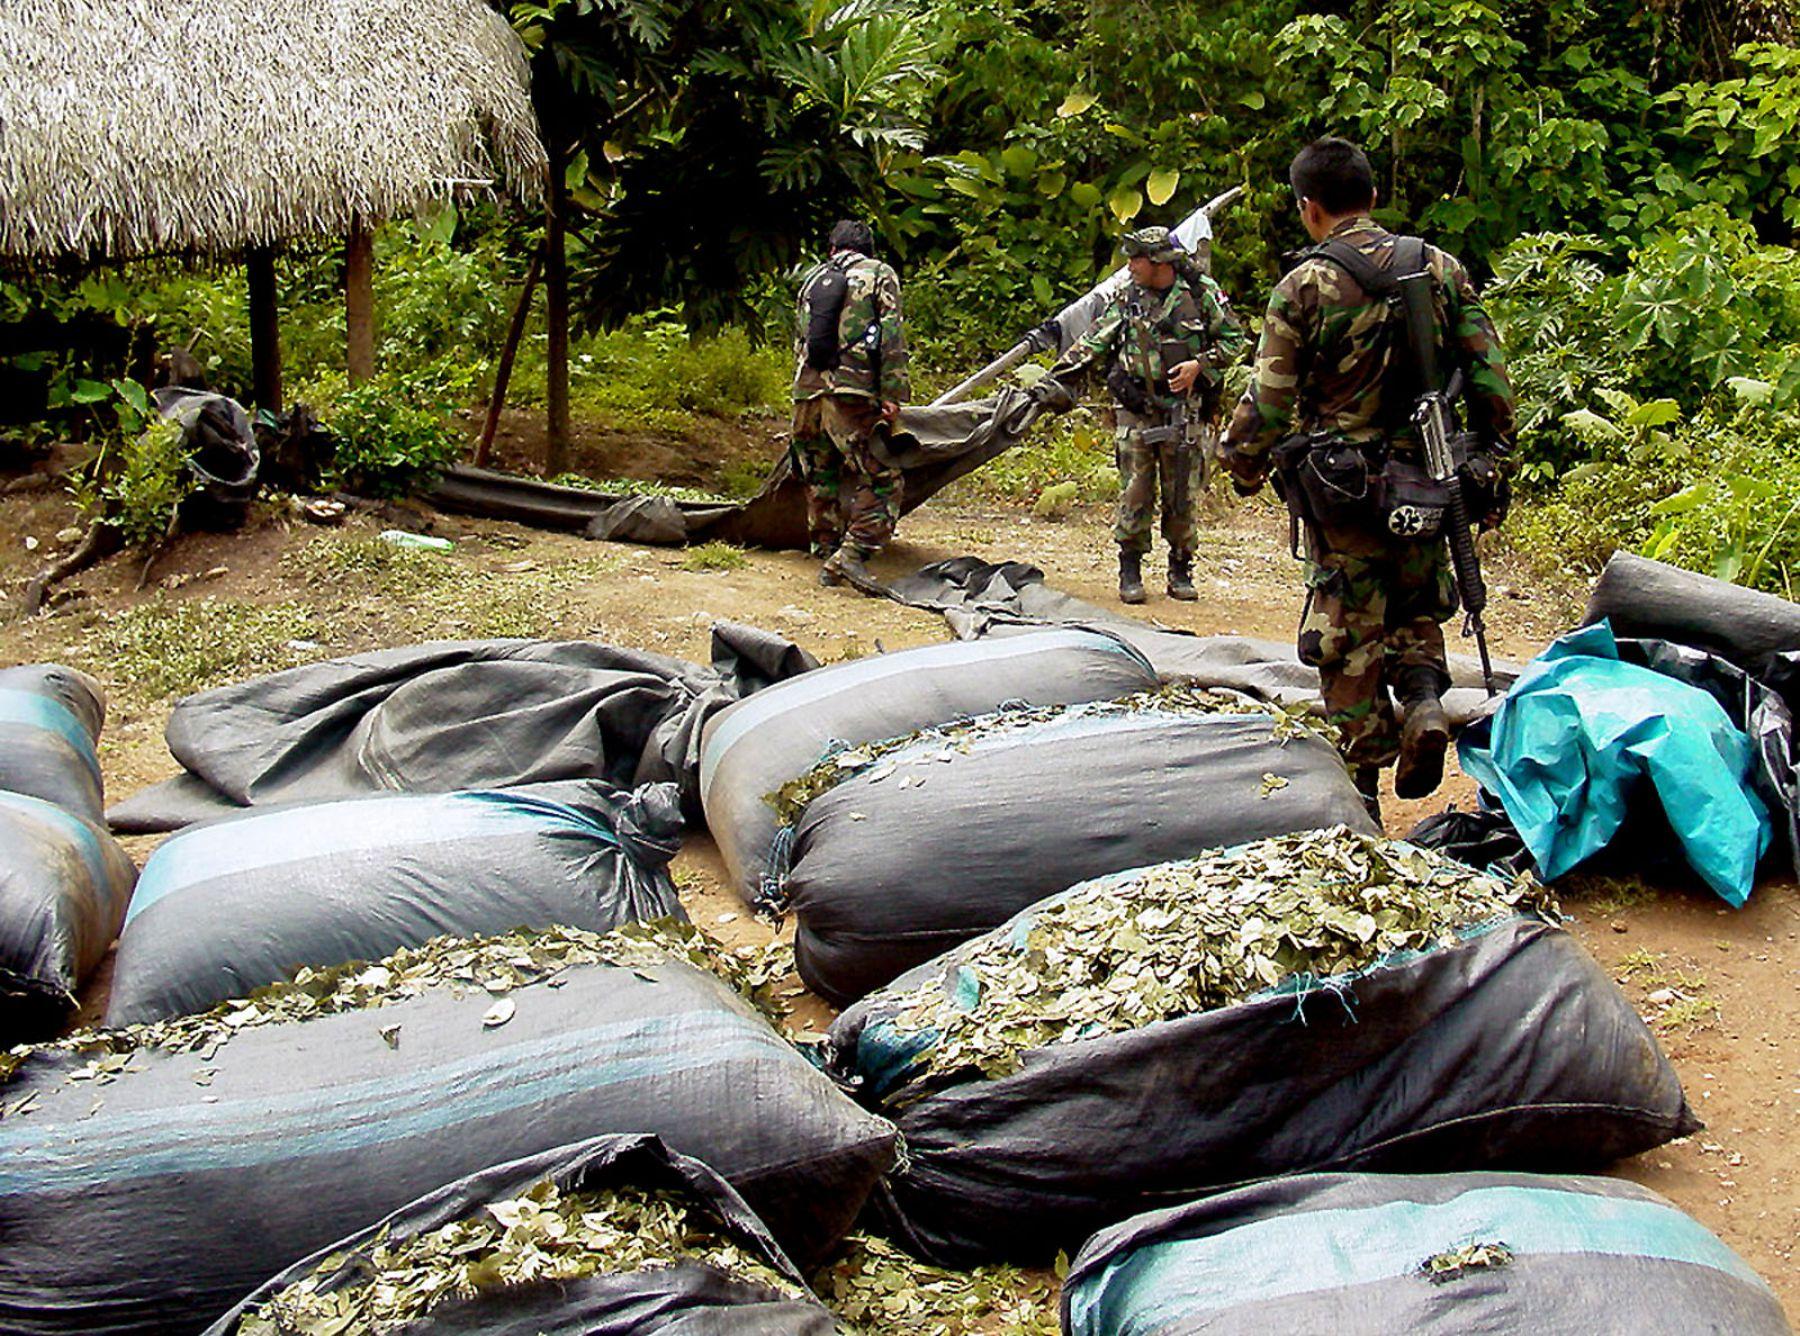 Sesiona en Nicaragua curso regional de lucha contra narcotráfico